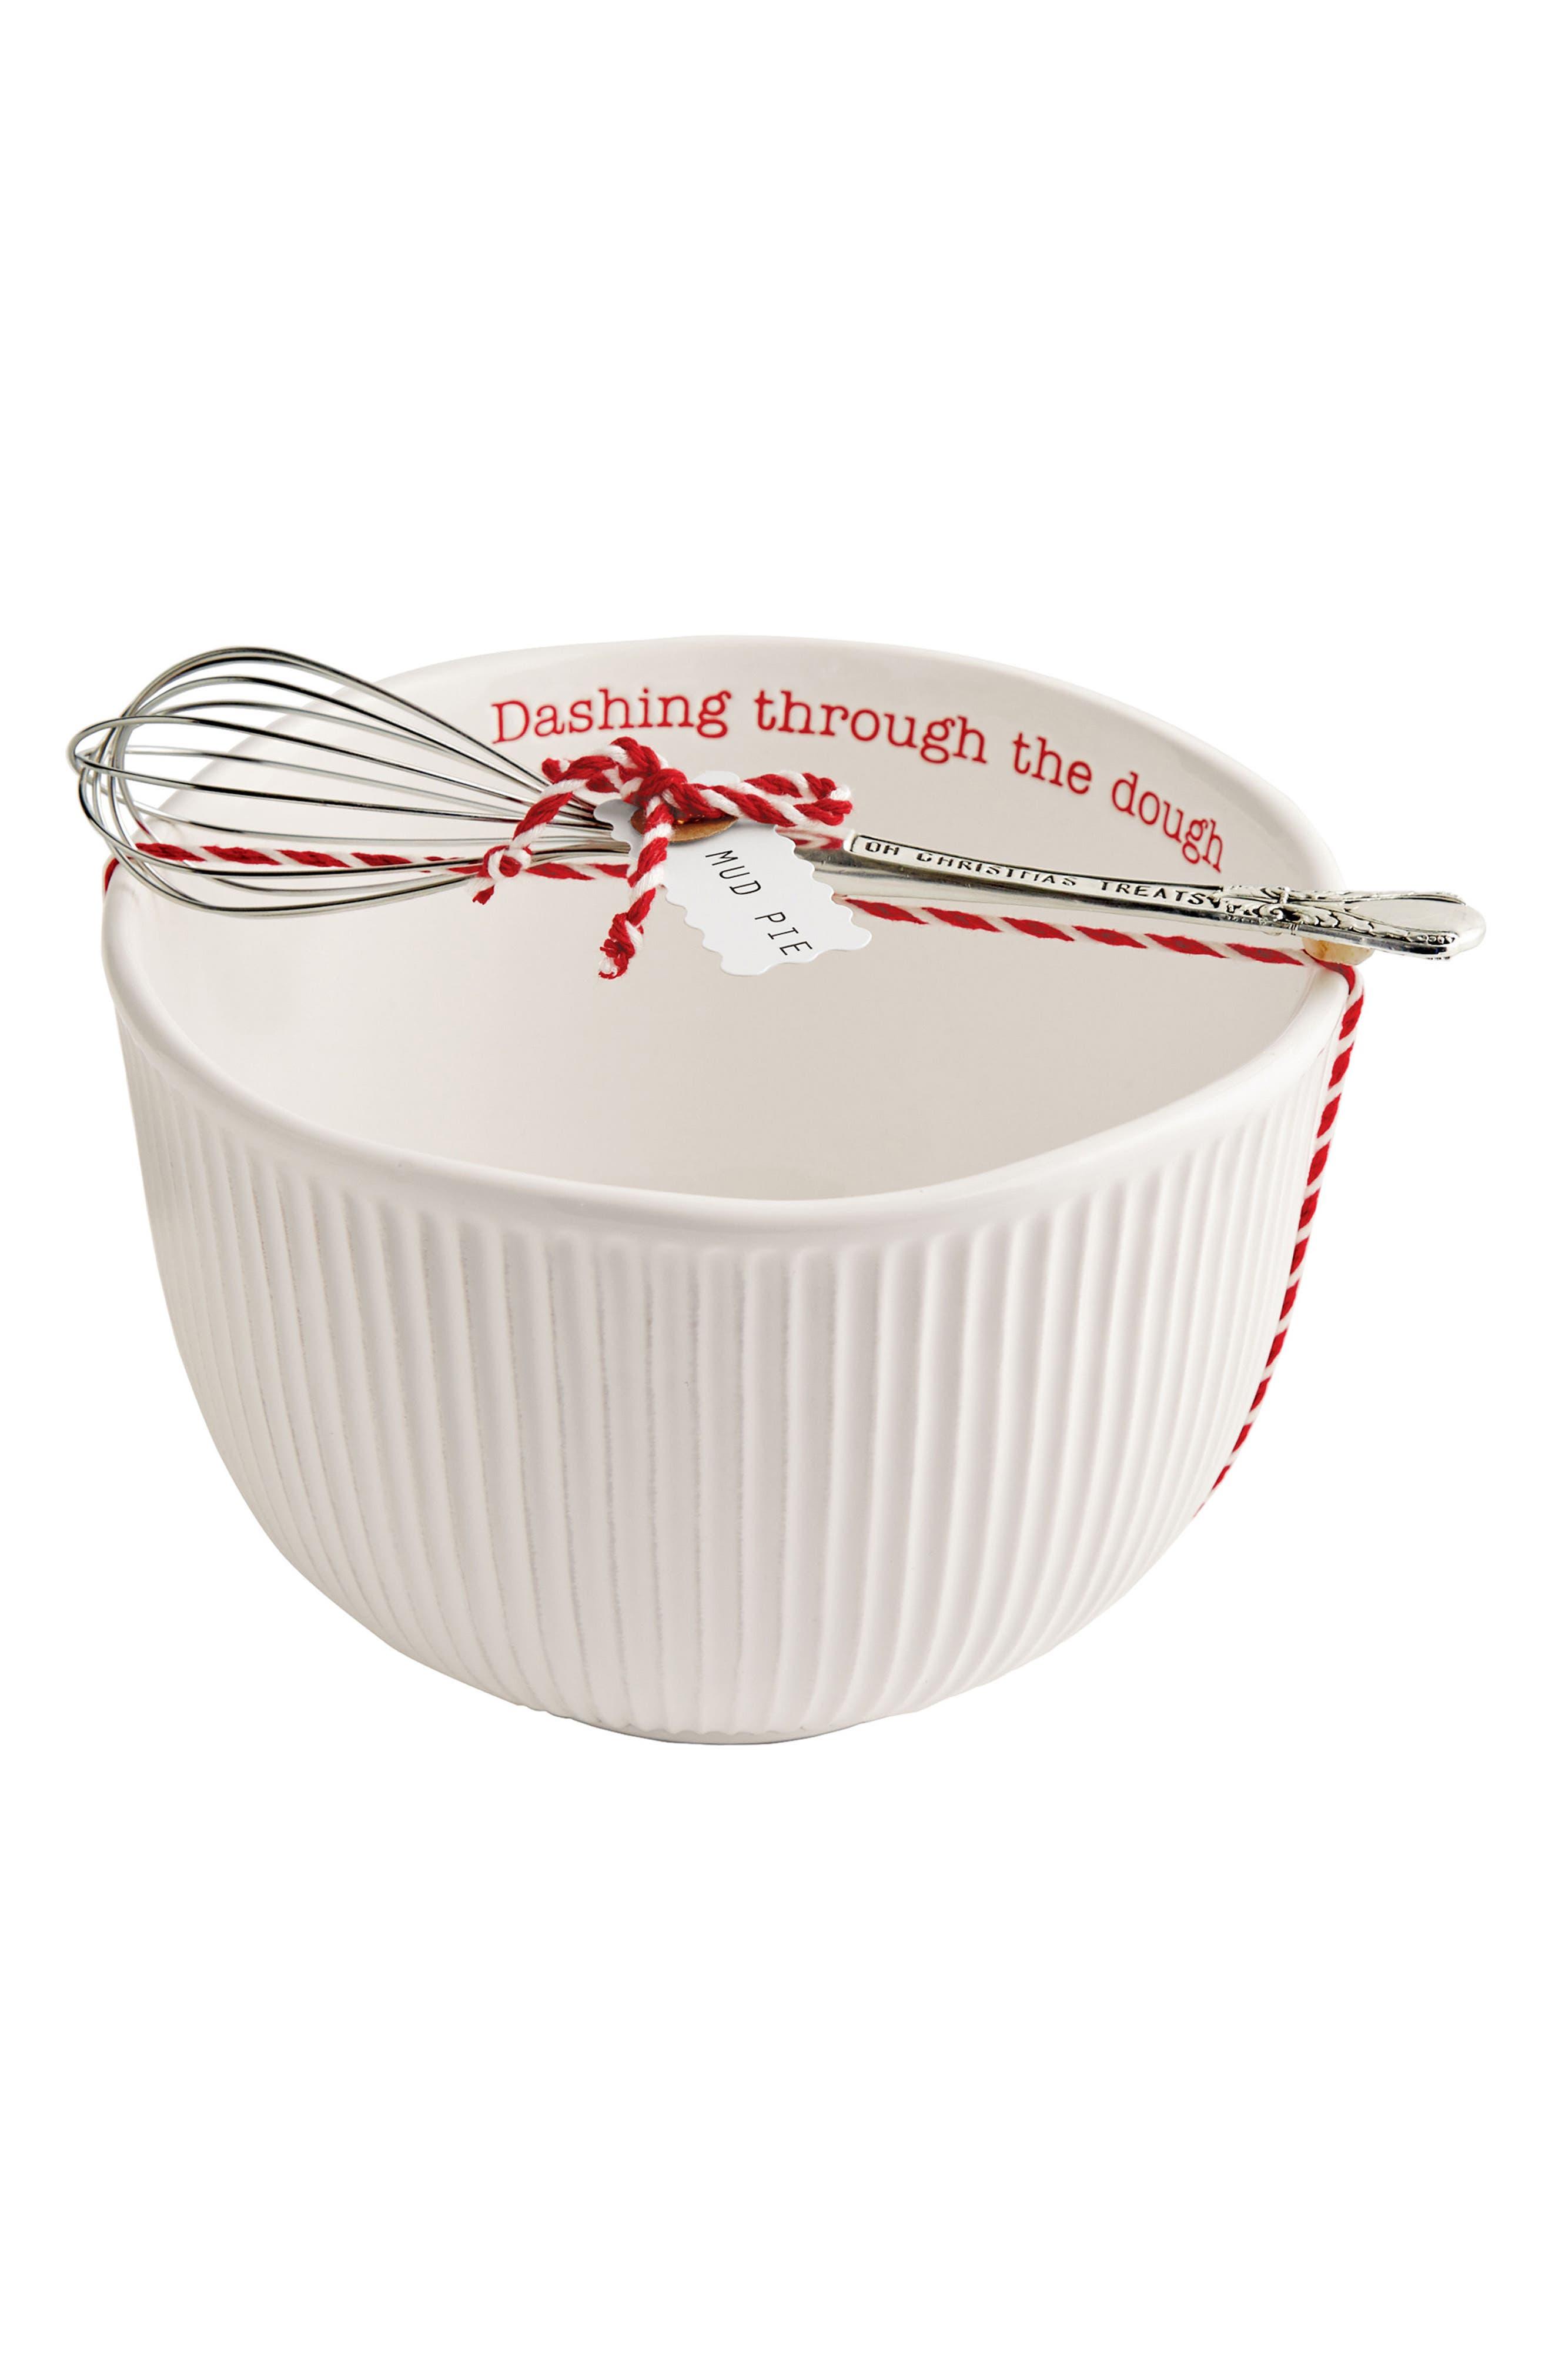 Alternate Image 1 Selected - Mud Pie Holiday Stoneware Mixing Bowl & Whisk